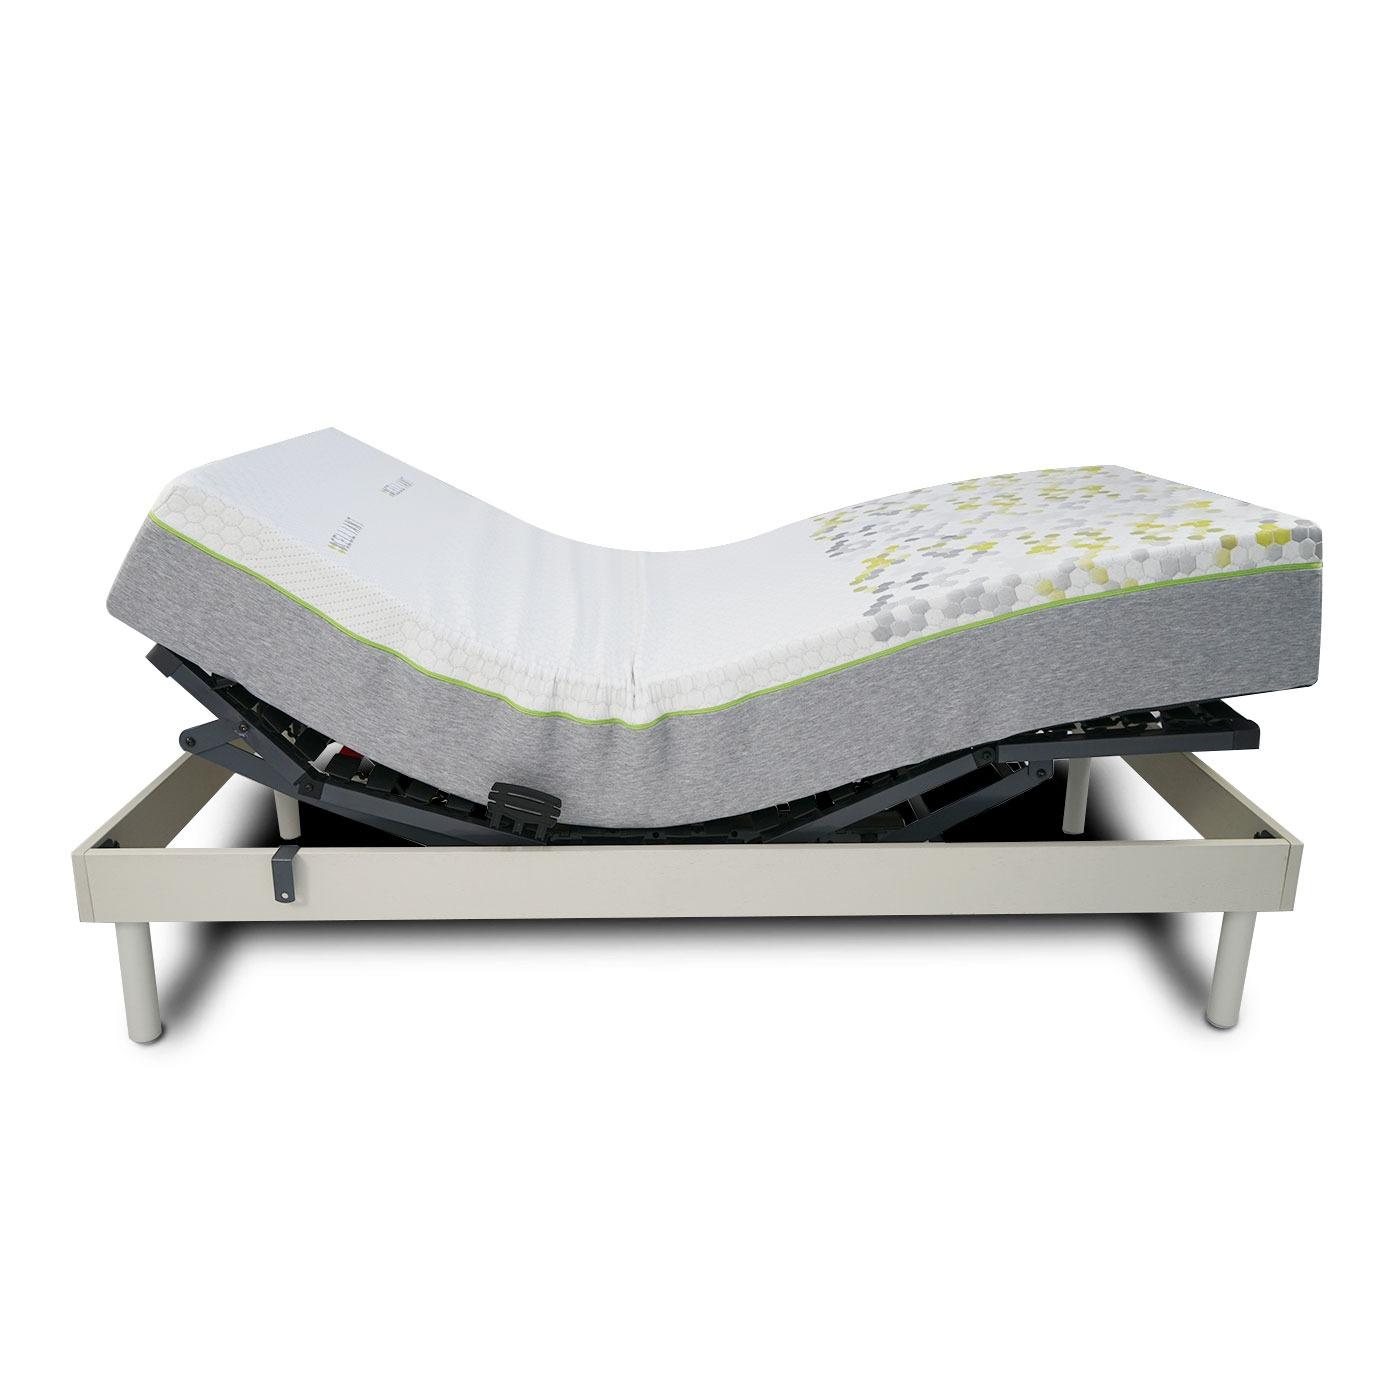 Cama articulada + Colchón Fisiocare Celliant